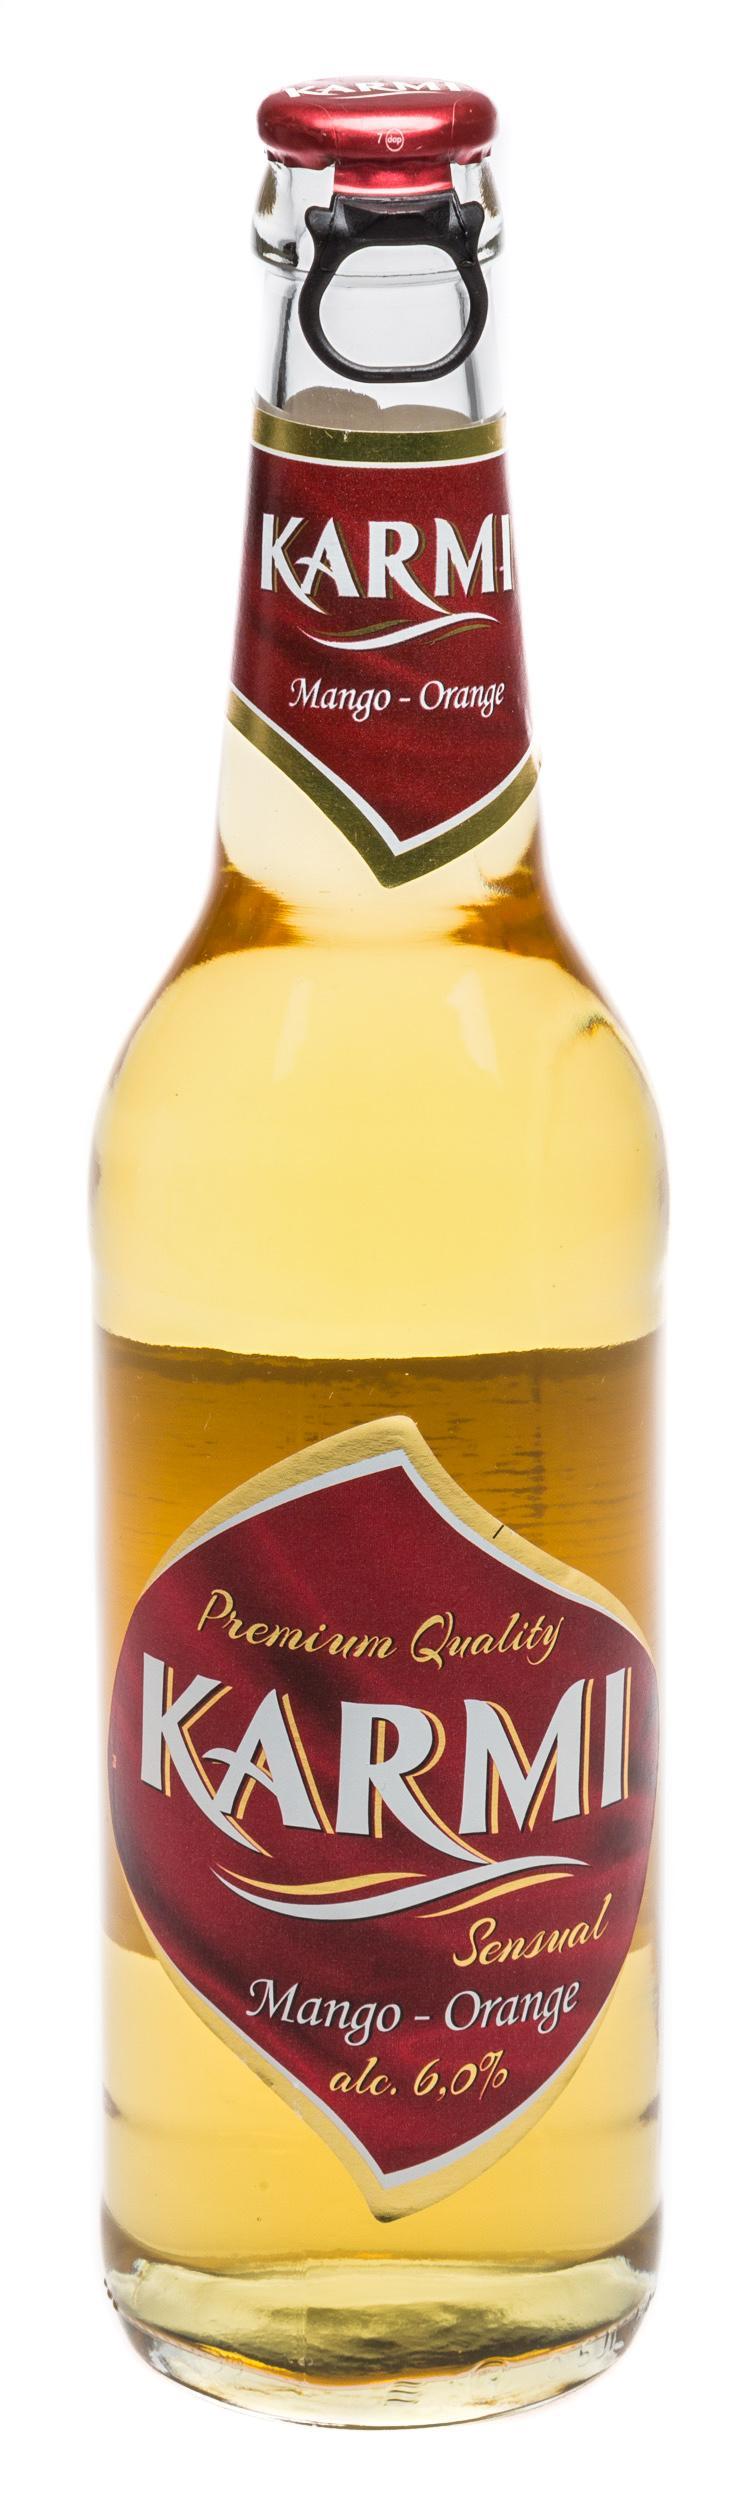 Пиво Karmi Sensual с ароматом манго и апельсина